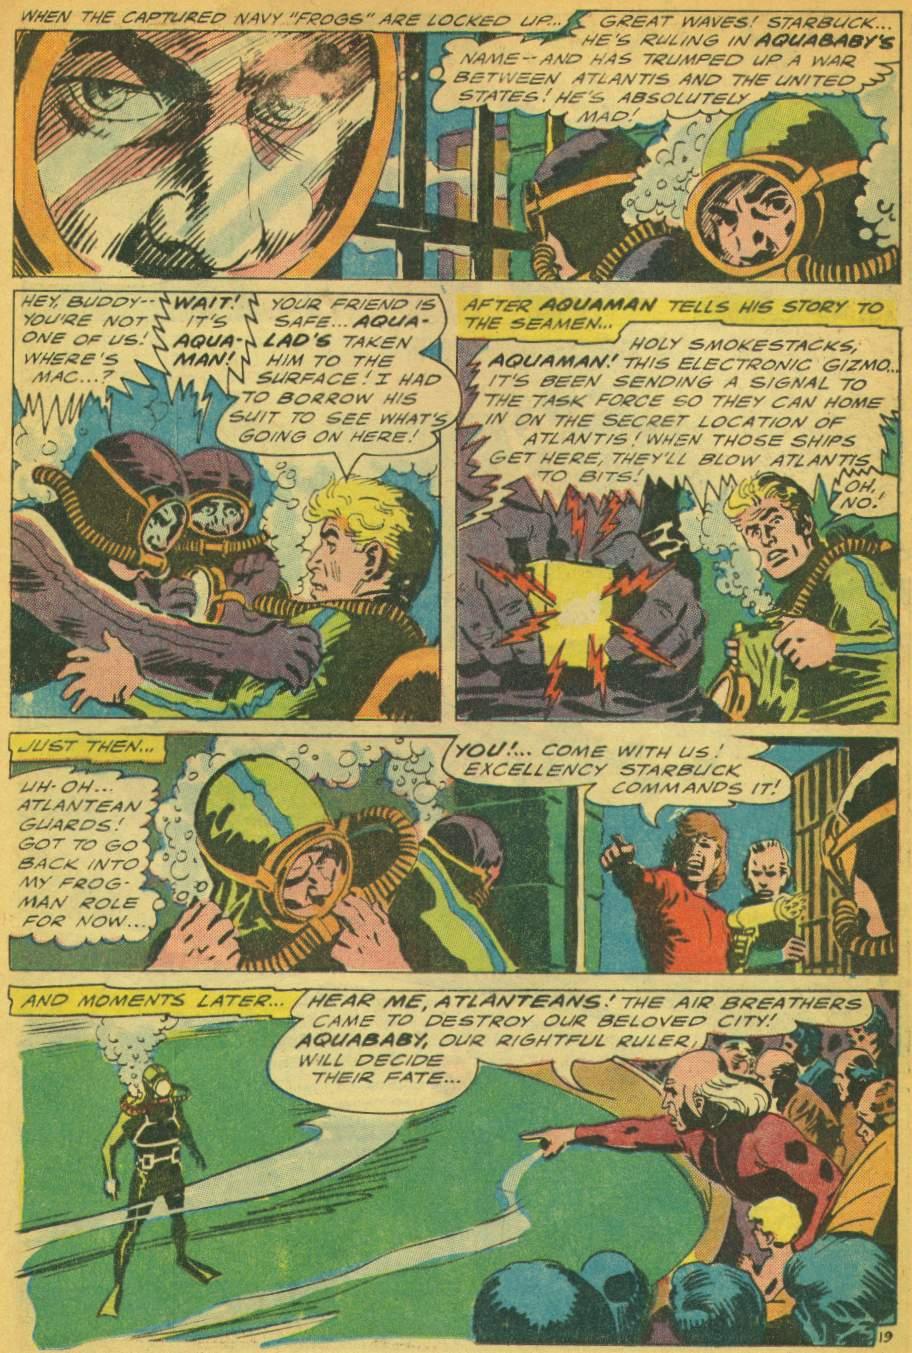 Read online Aquaman (1962) comic -  Issue #28 - 25